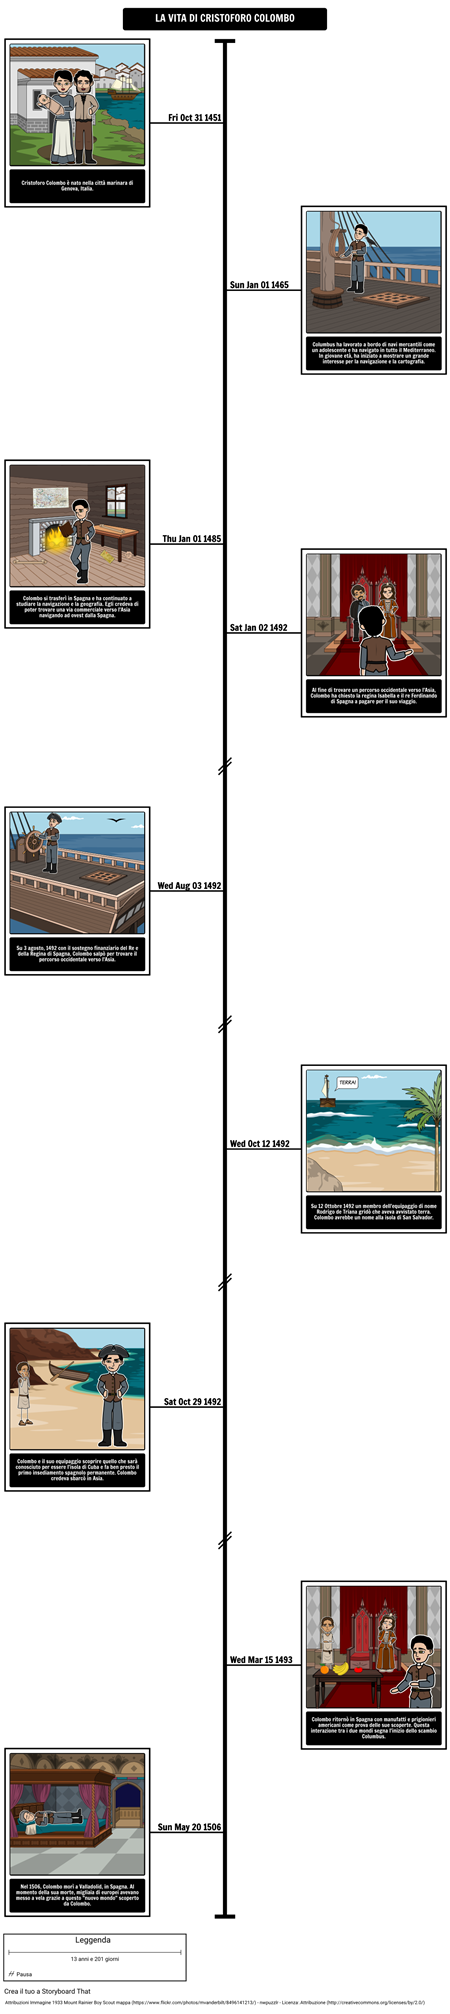 Age of Exploration - Cristoforo Colombo Timeline